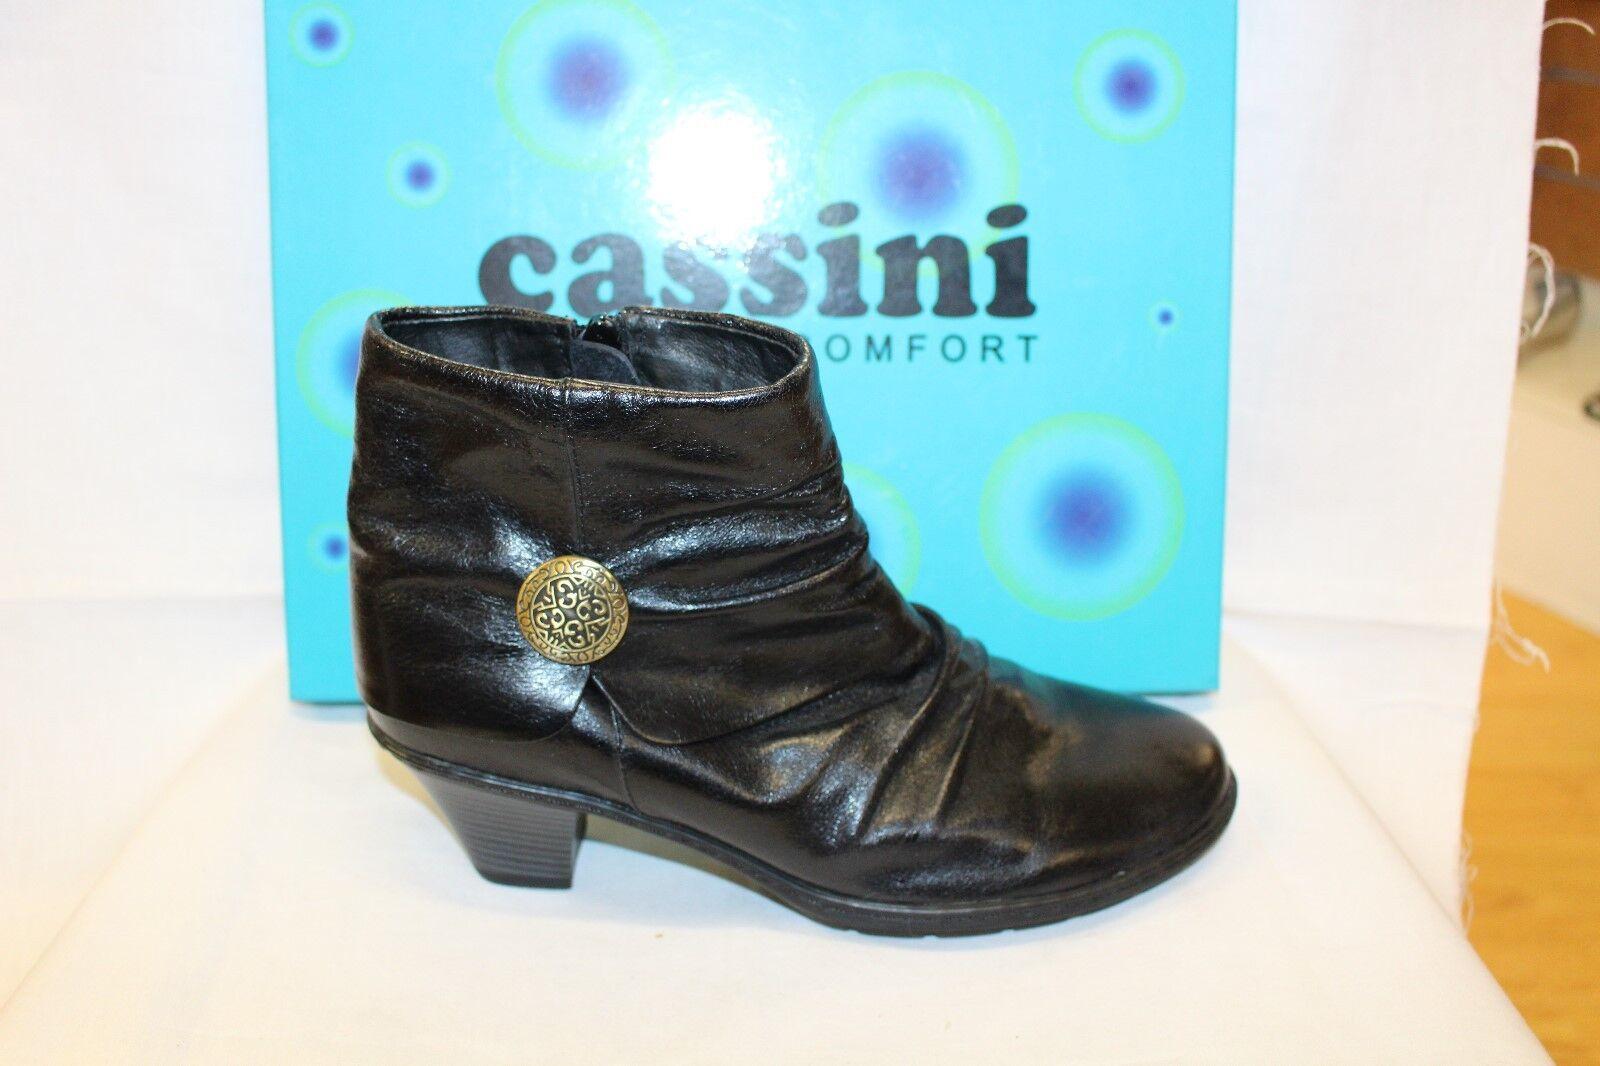 LADIES SHOES FOOTWEAR - Cassini Boot Mercia black